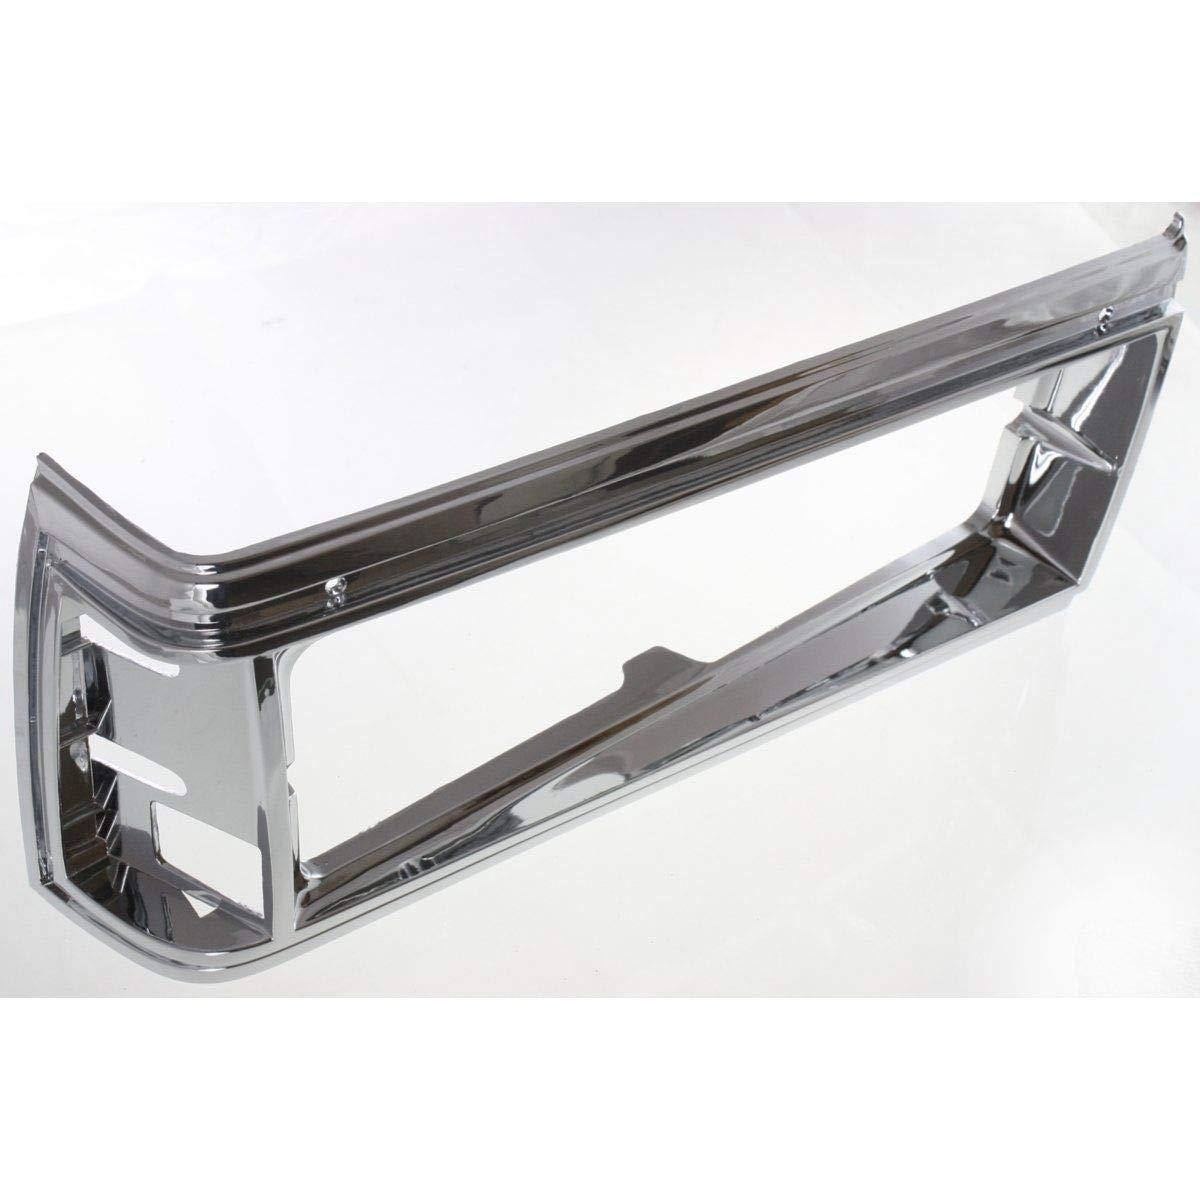 Headlight Door For 1981-85 Chevy Caprice 1987-89 Safari 1983-86 Parisienne Right